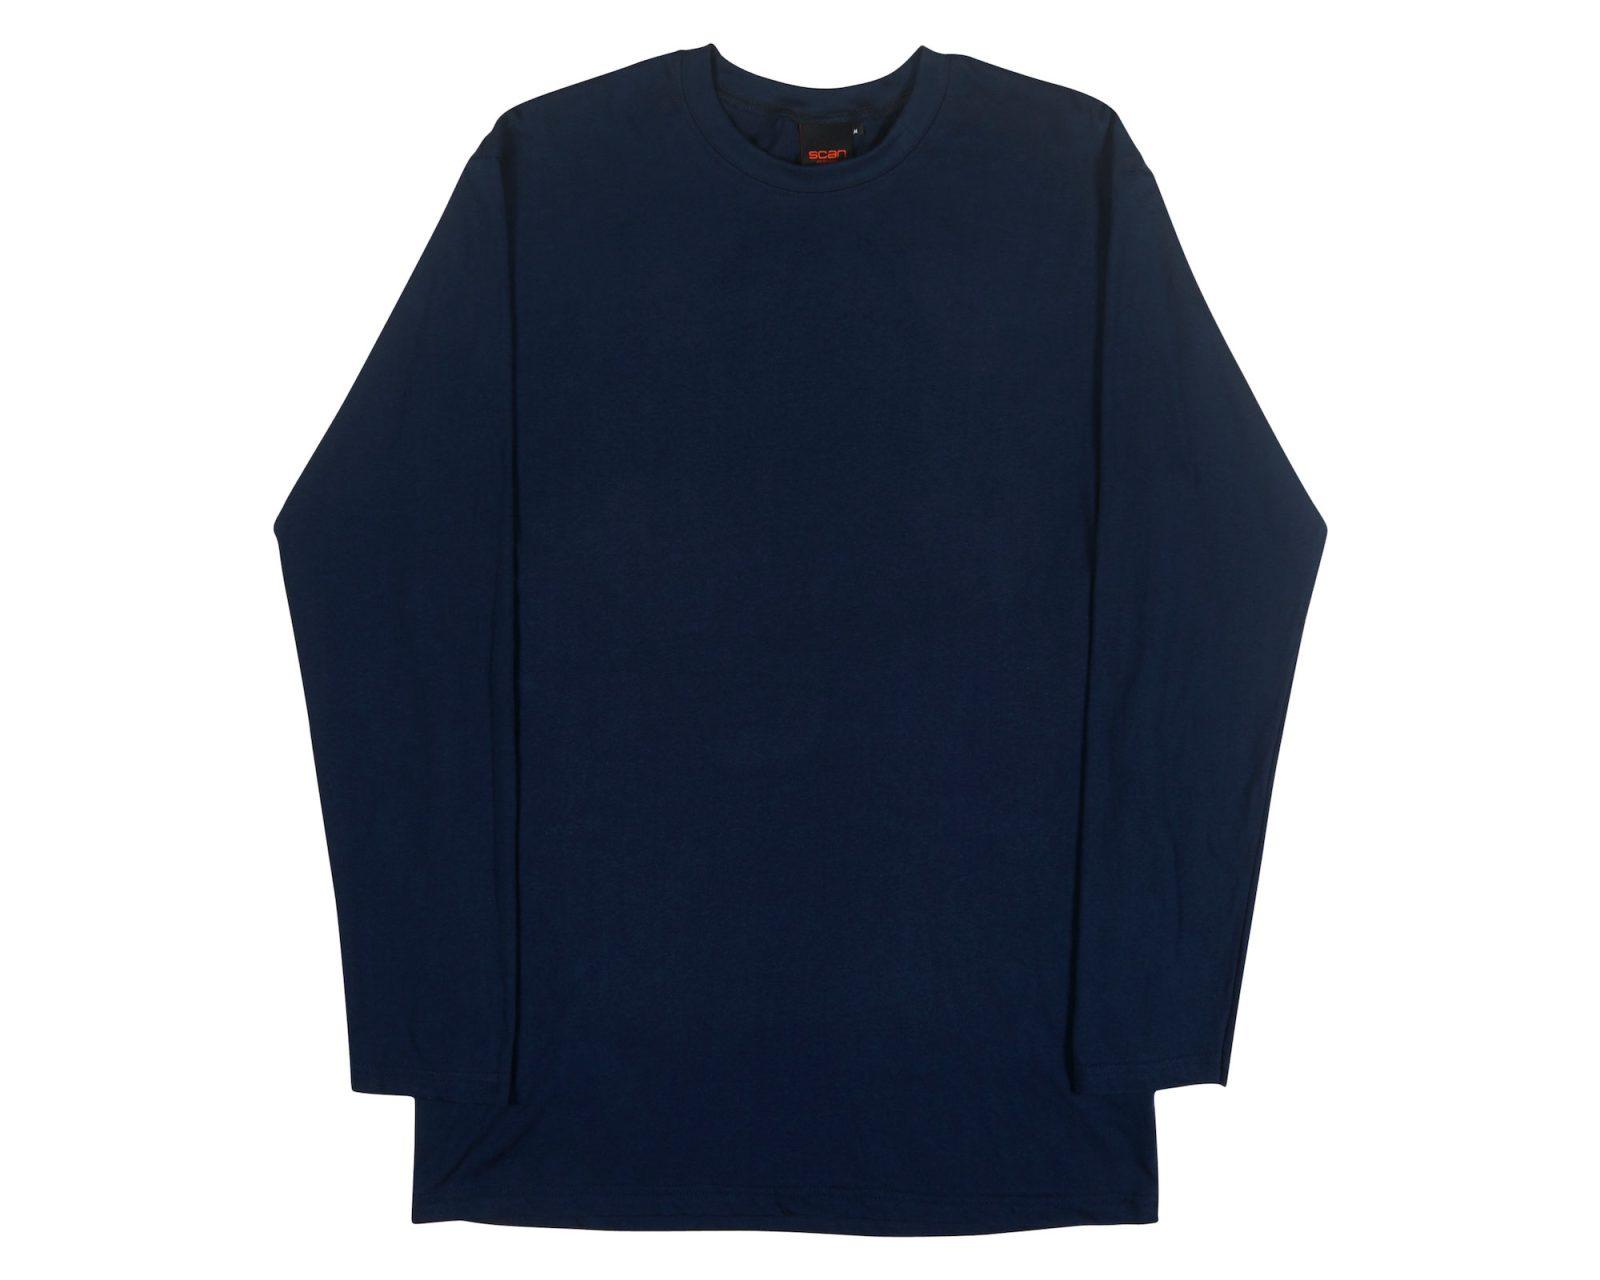 a660df710 Men's Tall L/S T-shirt   Australian Made Longline Tee   Qualitops